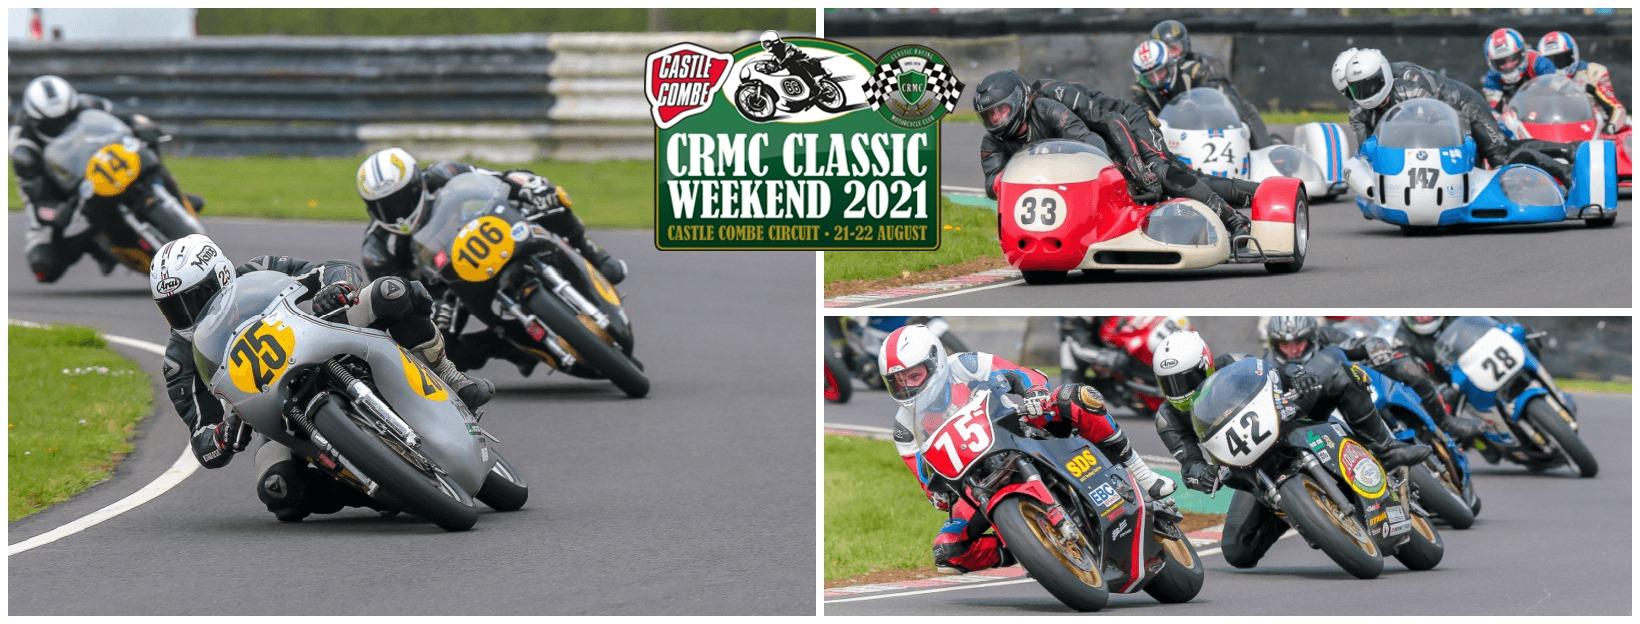 Grand Prix & Historic Bike Display to Feature at CRMC Classic Bike Weekend